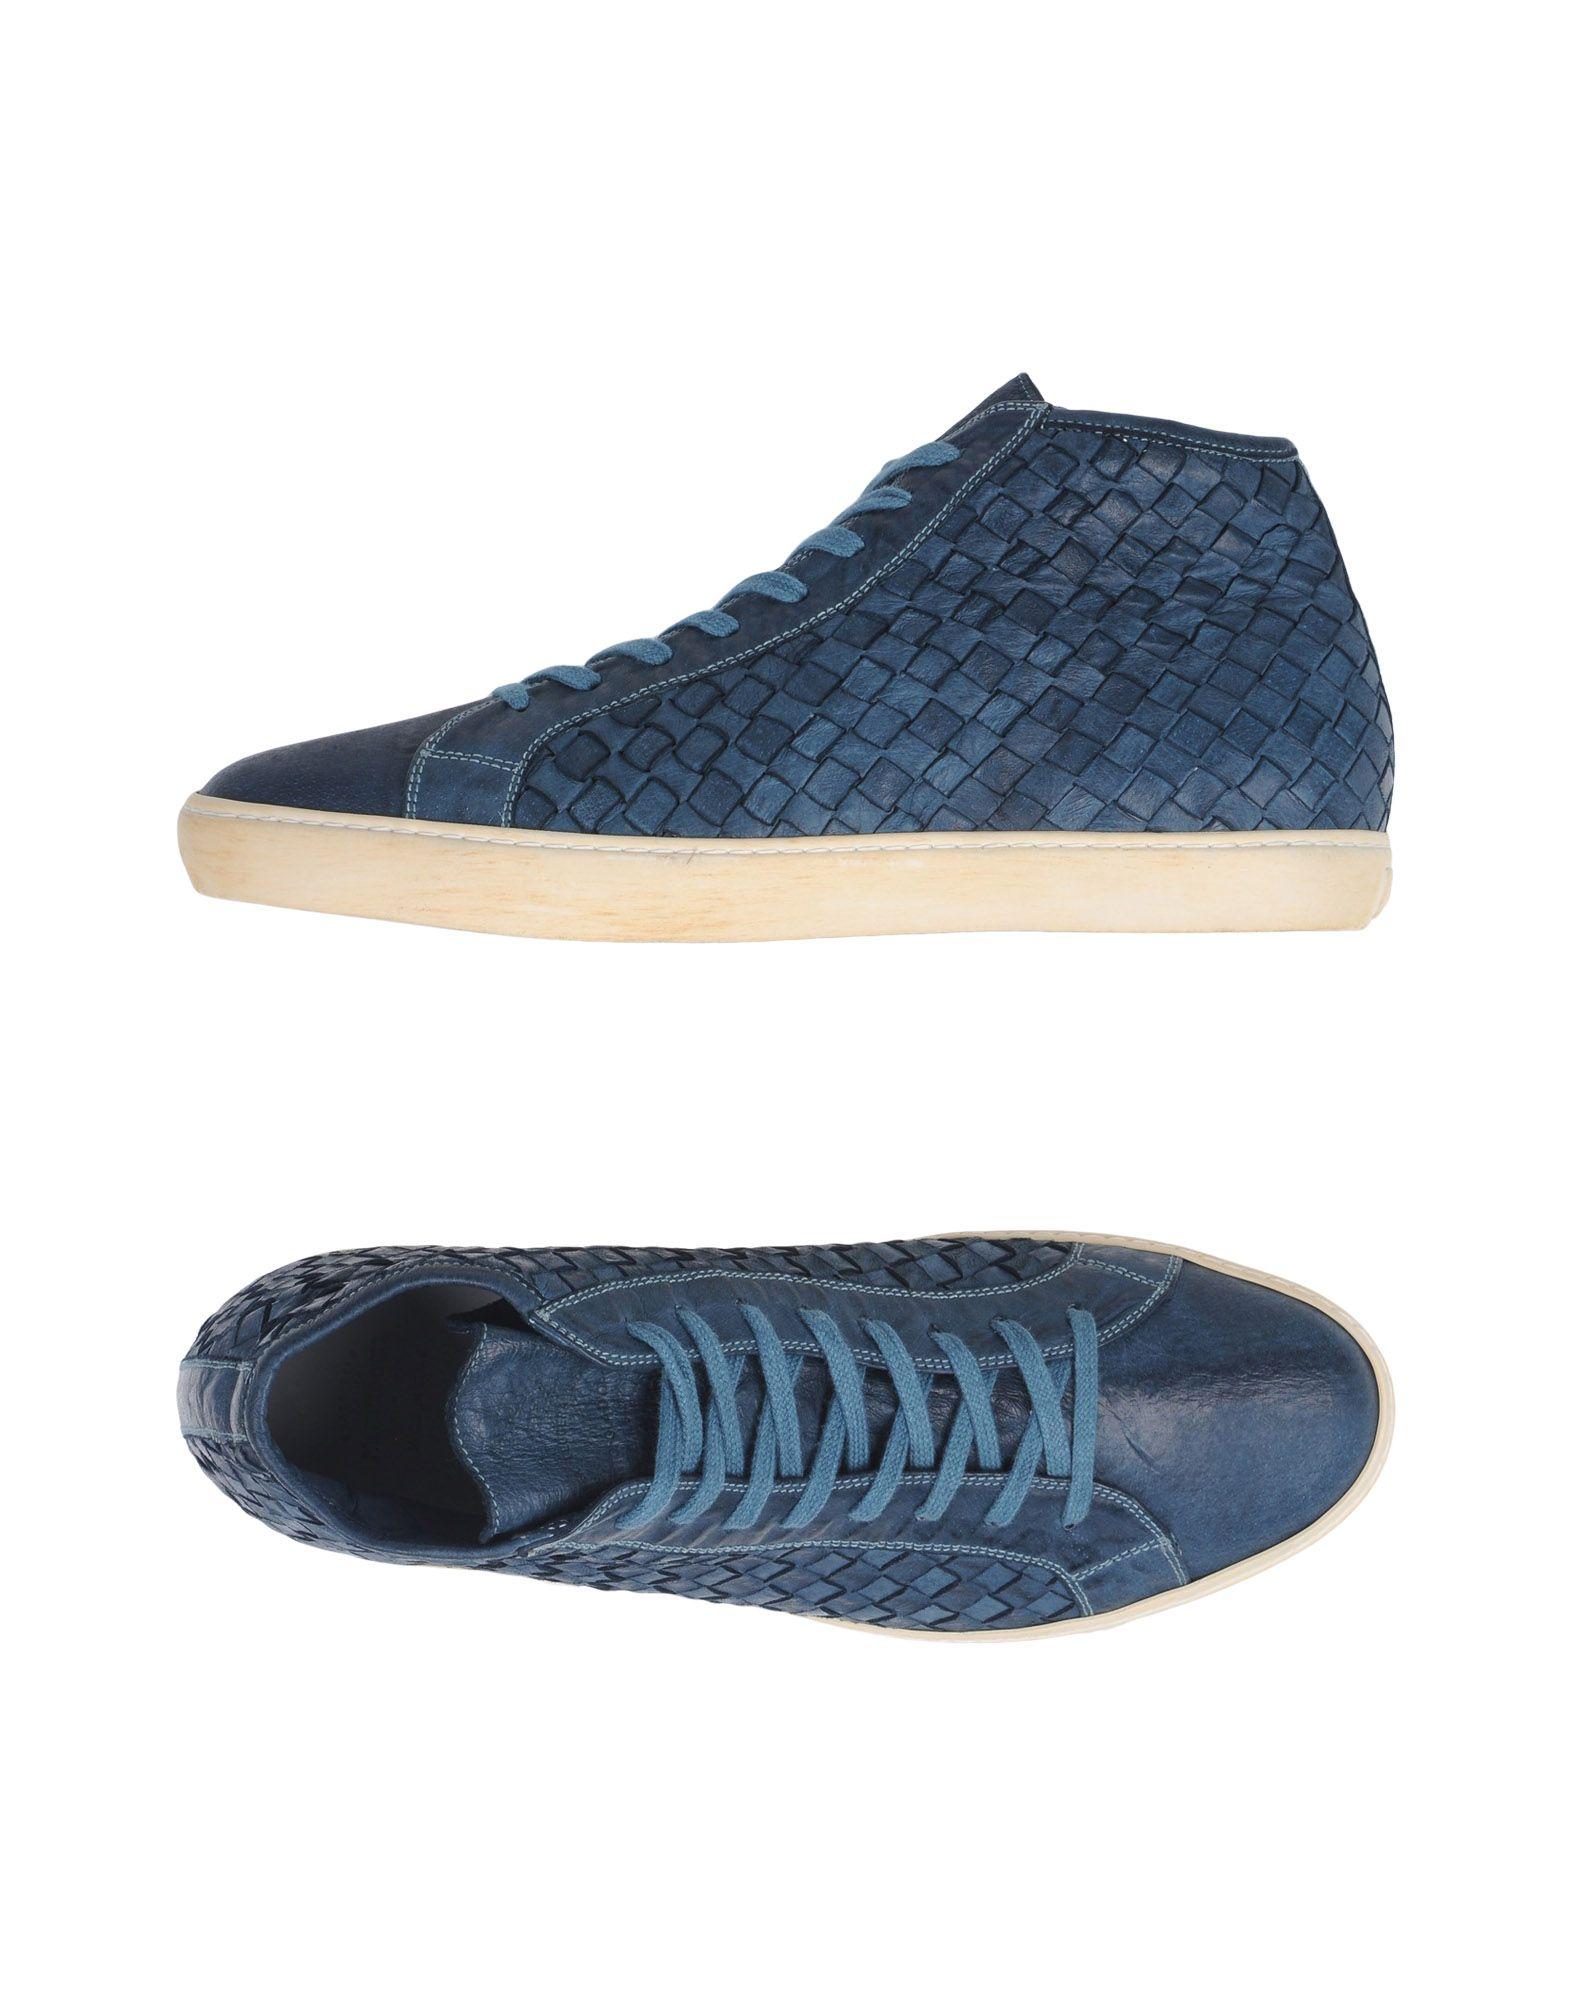 Pantofola D'oro Neue Sneakers Herren  11353952PL Neue D'oro Schuhe 002474